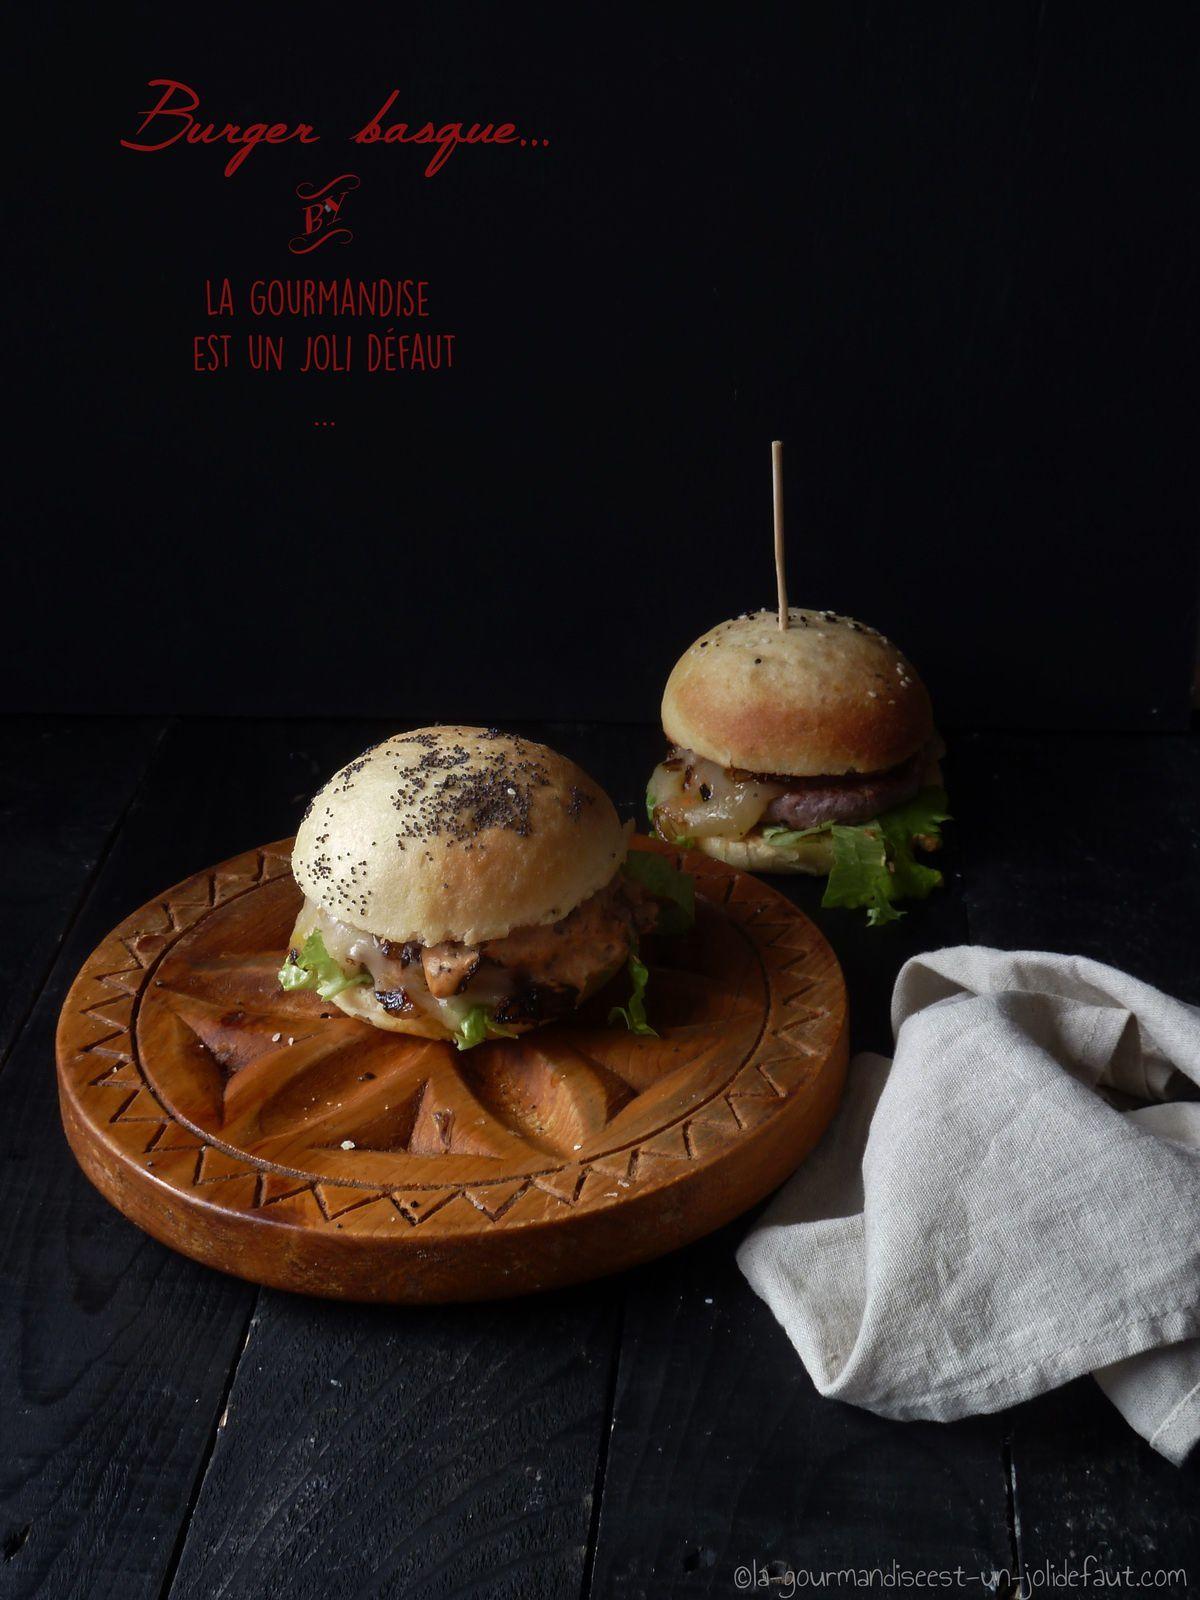 Burgers basques